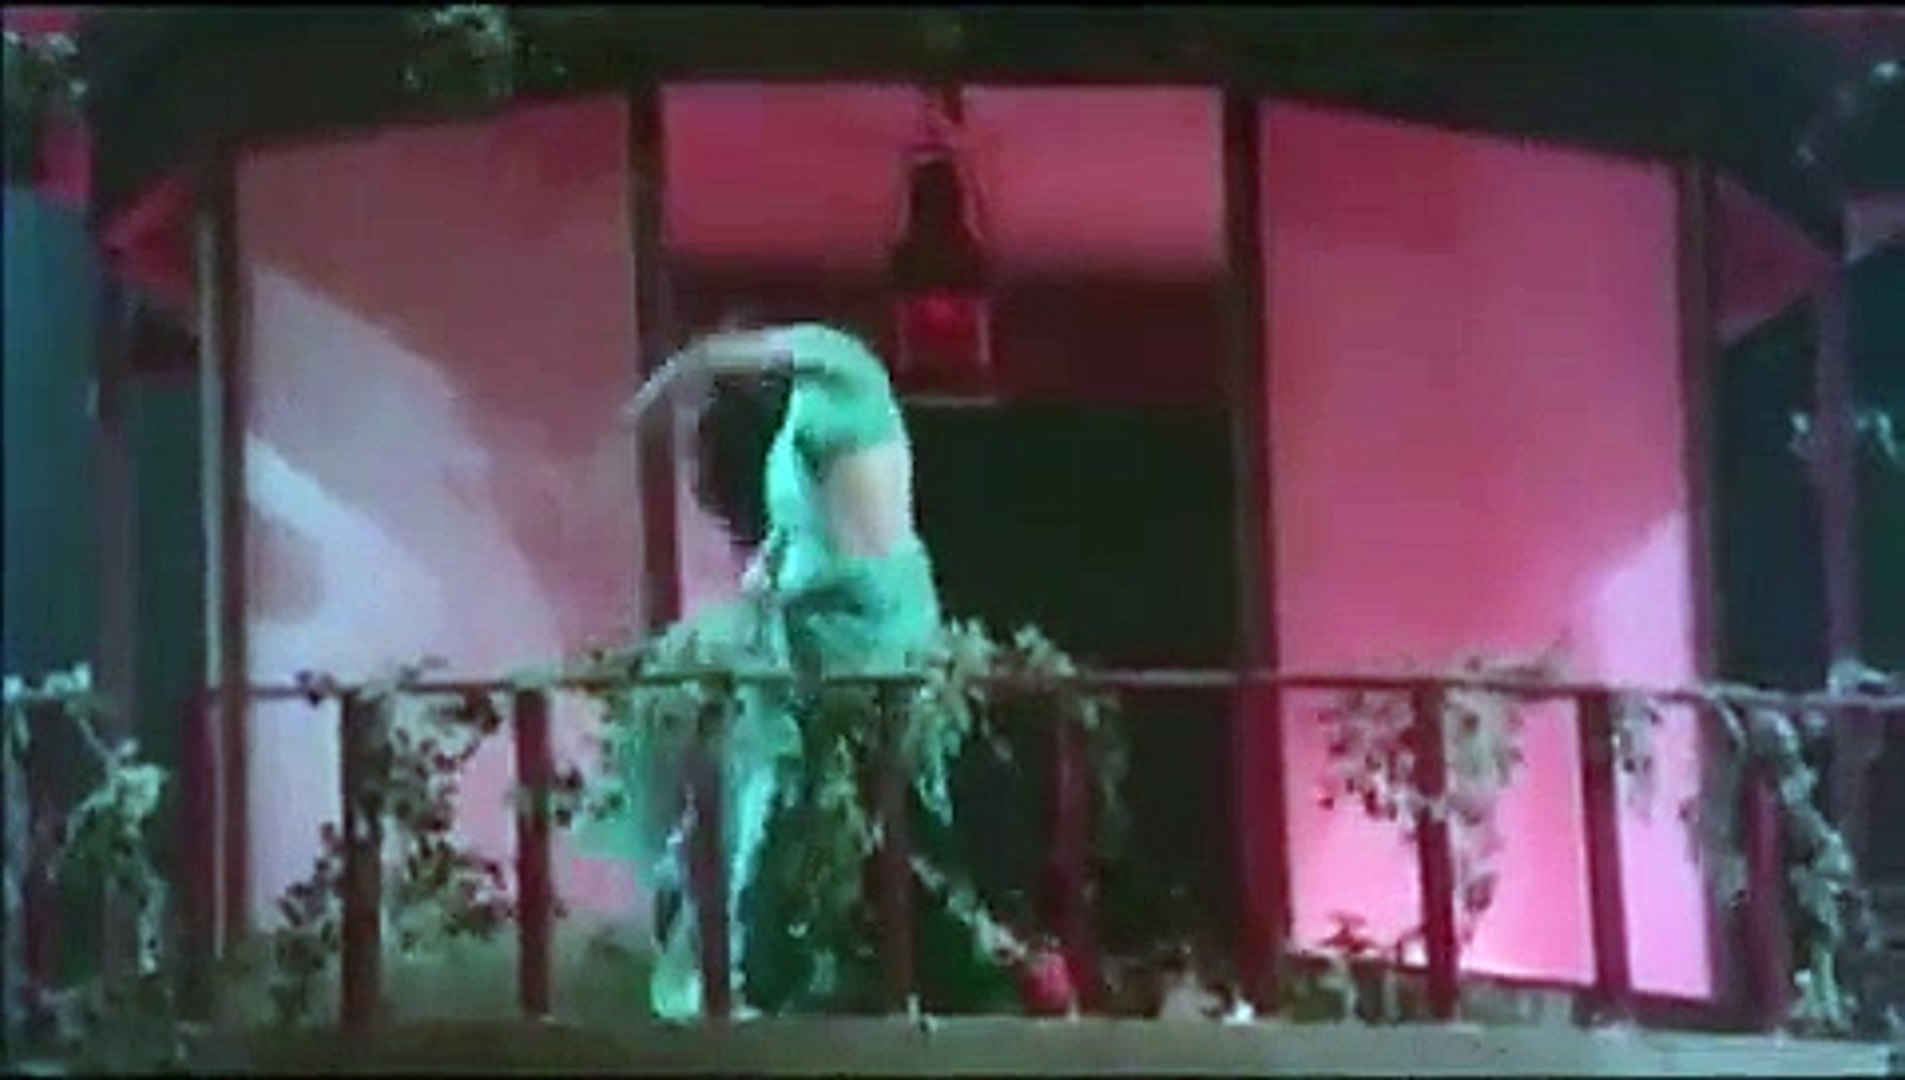 I Love You - Anil Kapoor - Sridevi - Mr. India - Kishore - Alisha - Superhit Hindi Songs